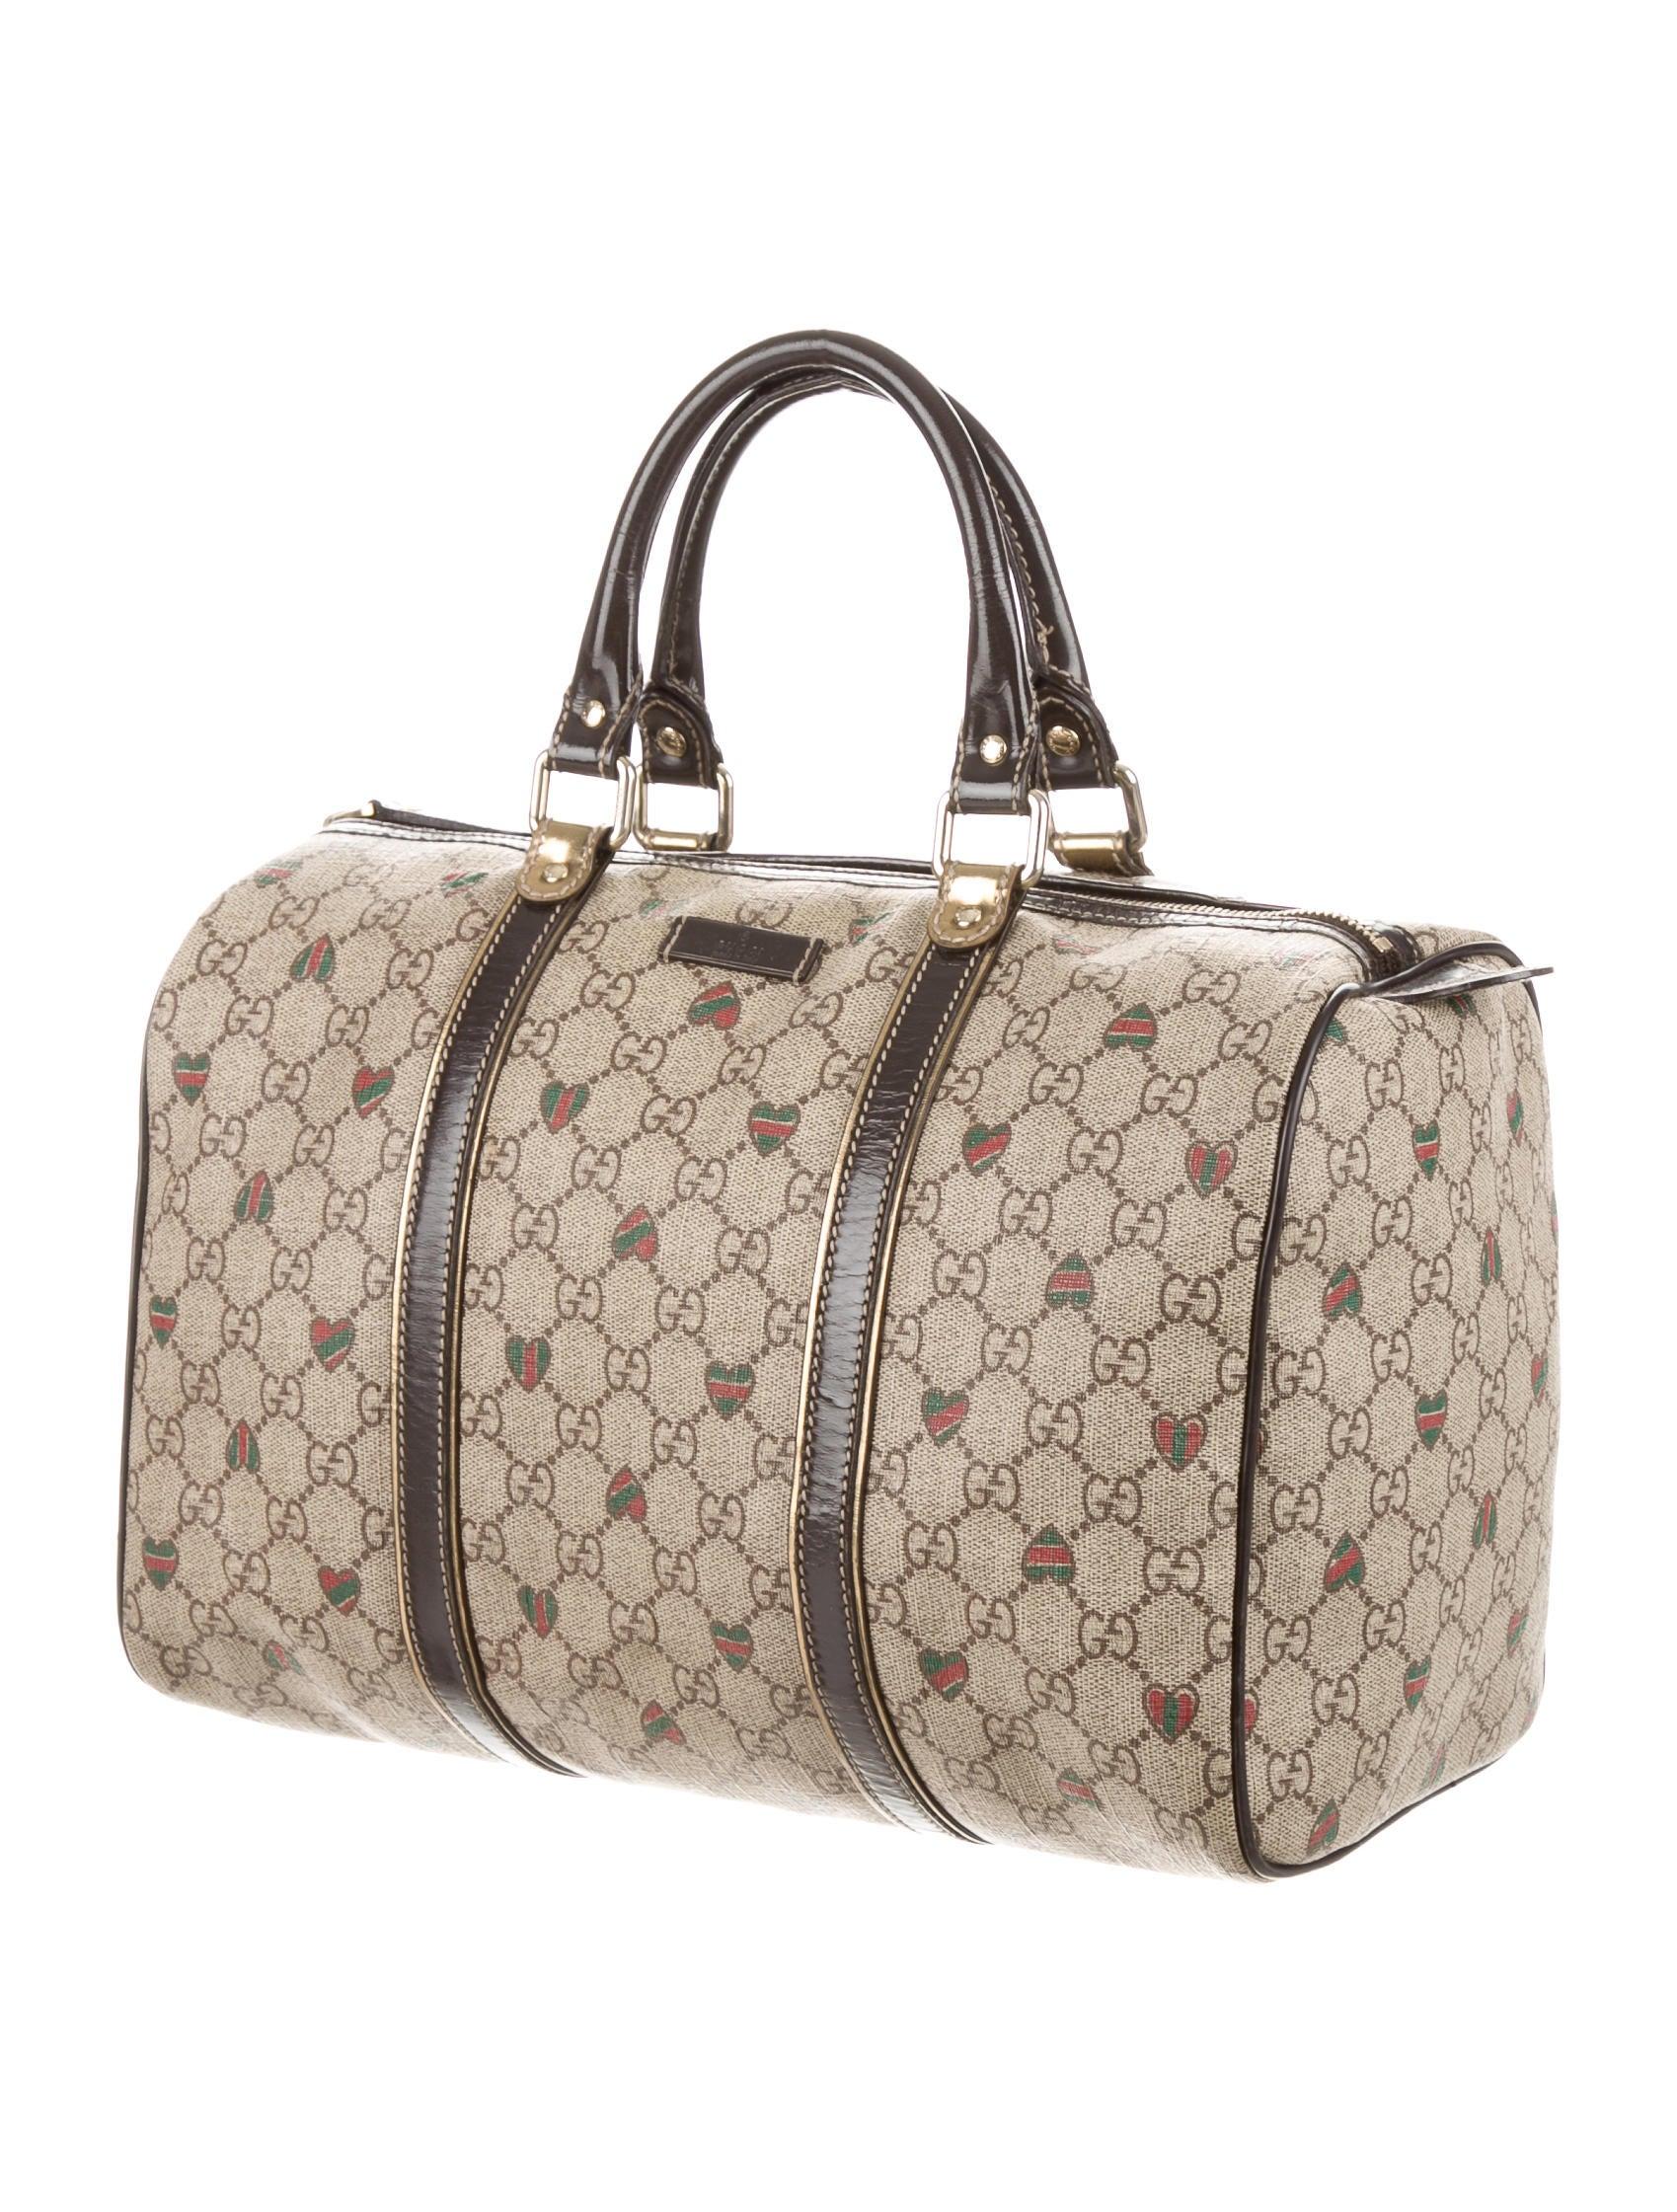 Boston Bag Patchwork Tutorial: Gucci Tattoo Hearts Joy Boston Bag